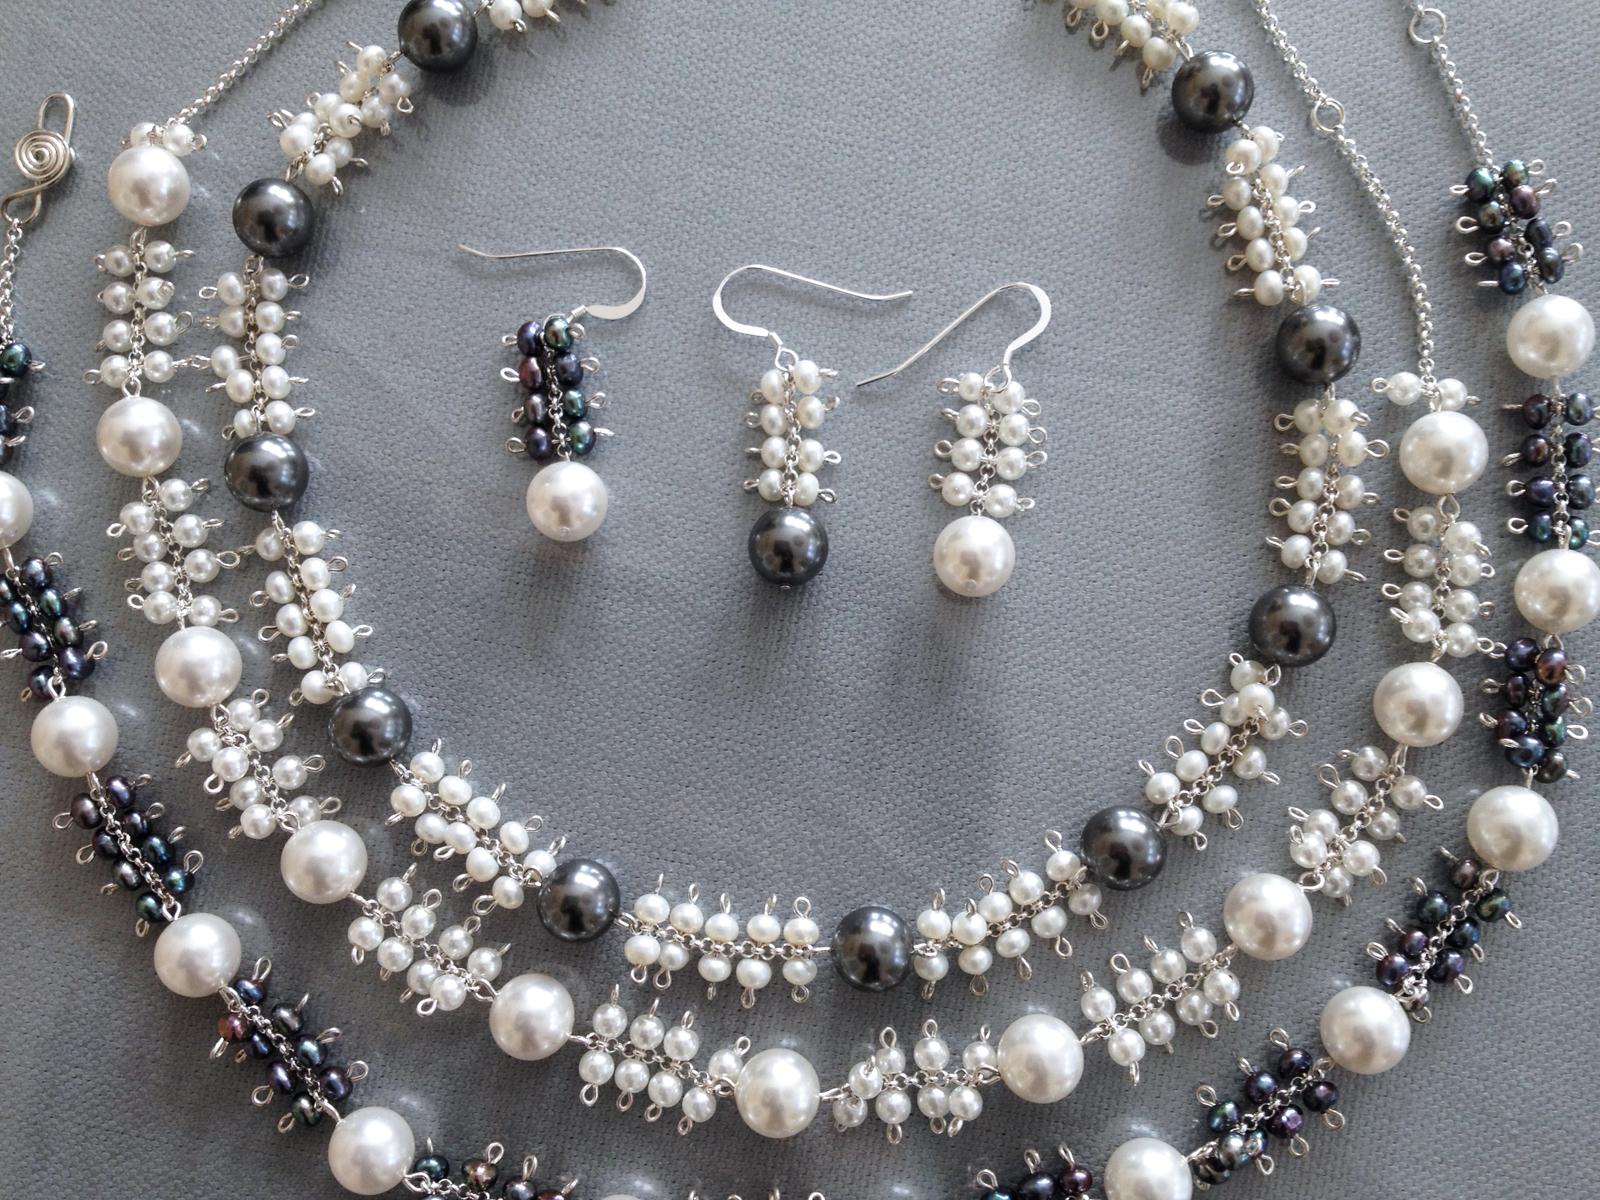 Bubbles-Black & White 2004  Necklace, Bracelet & Earrings  Freshwater Pearl, Swarovski Pearl, Sterling Silver